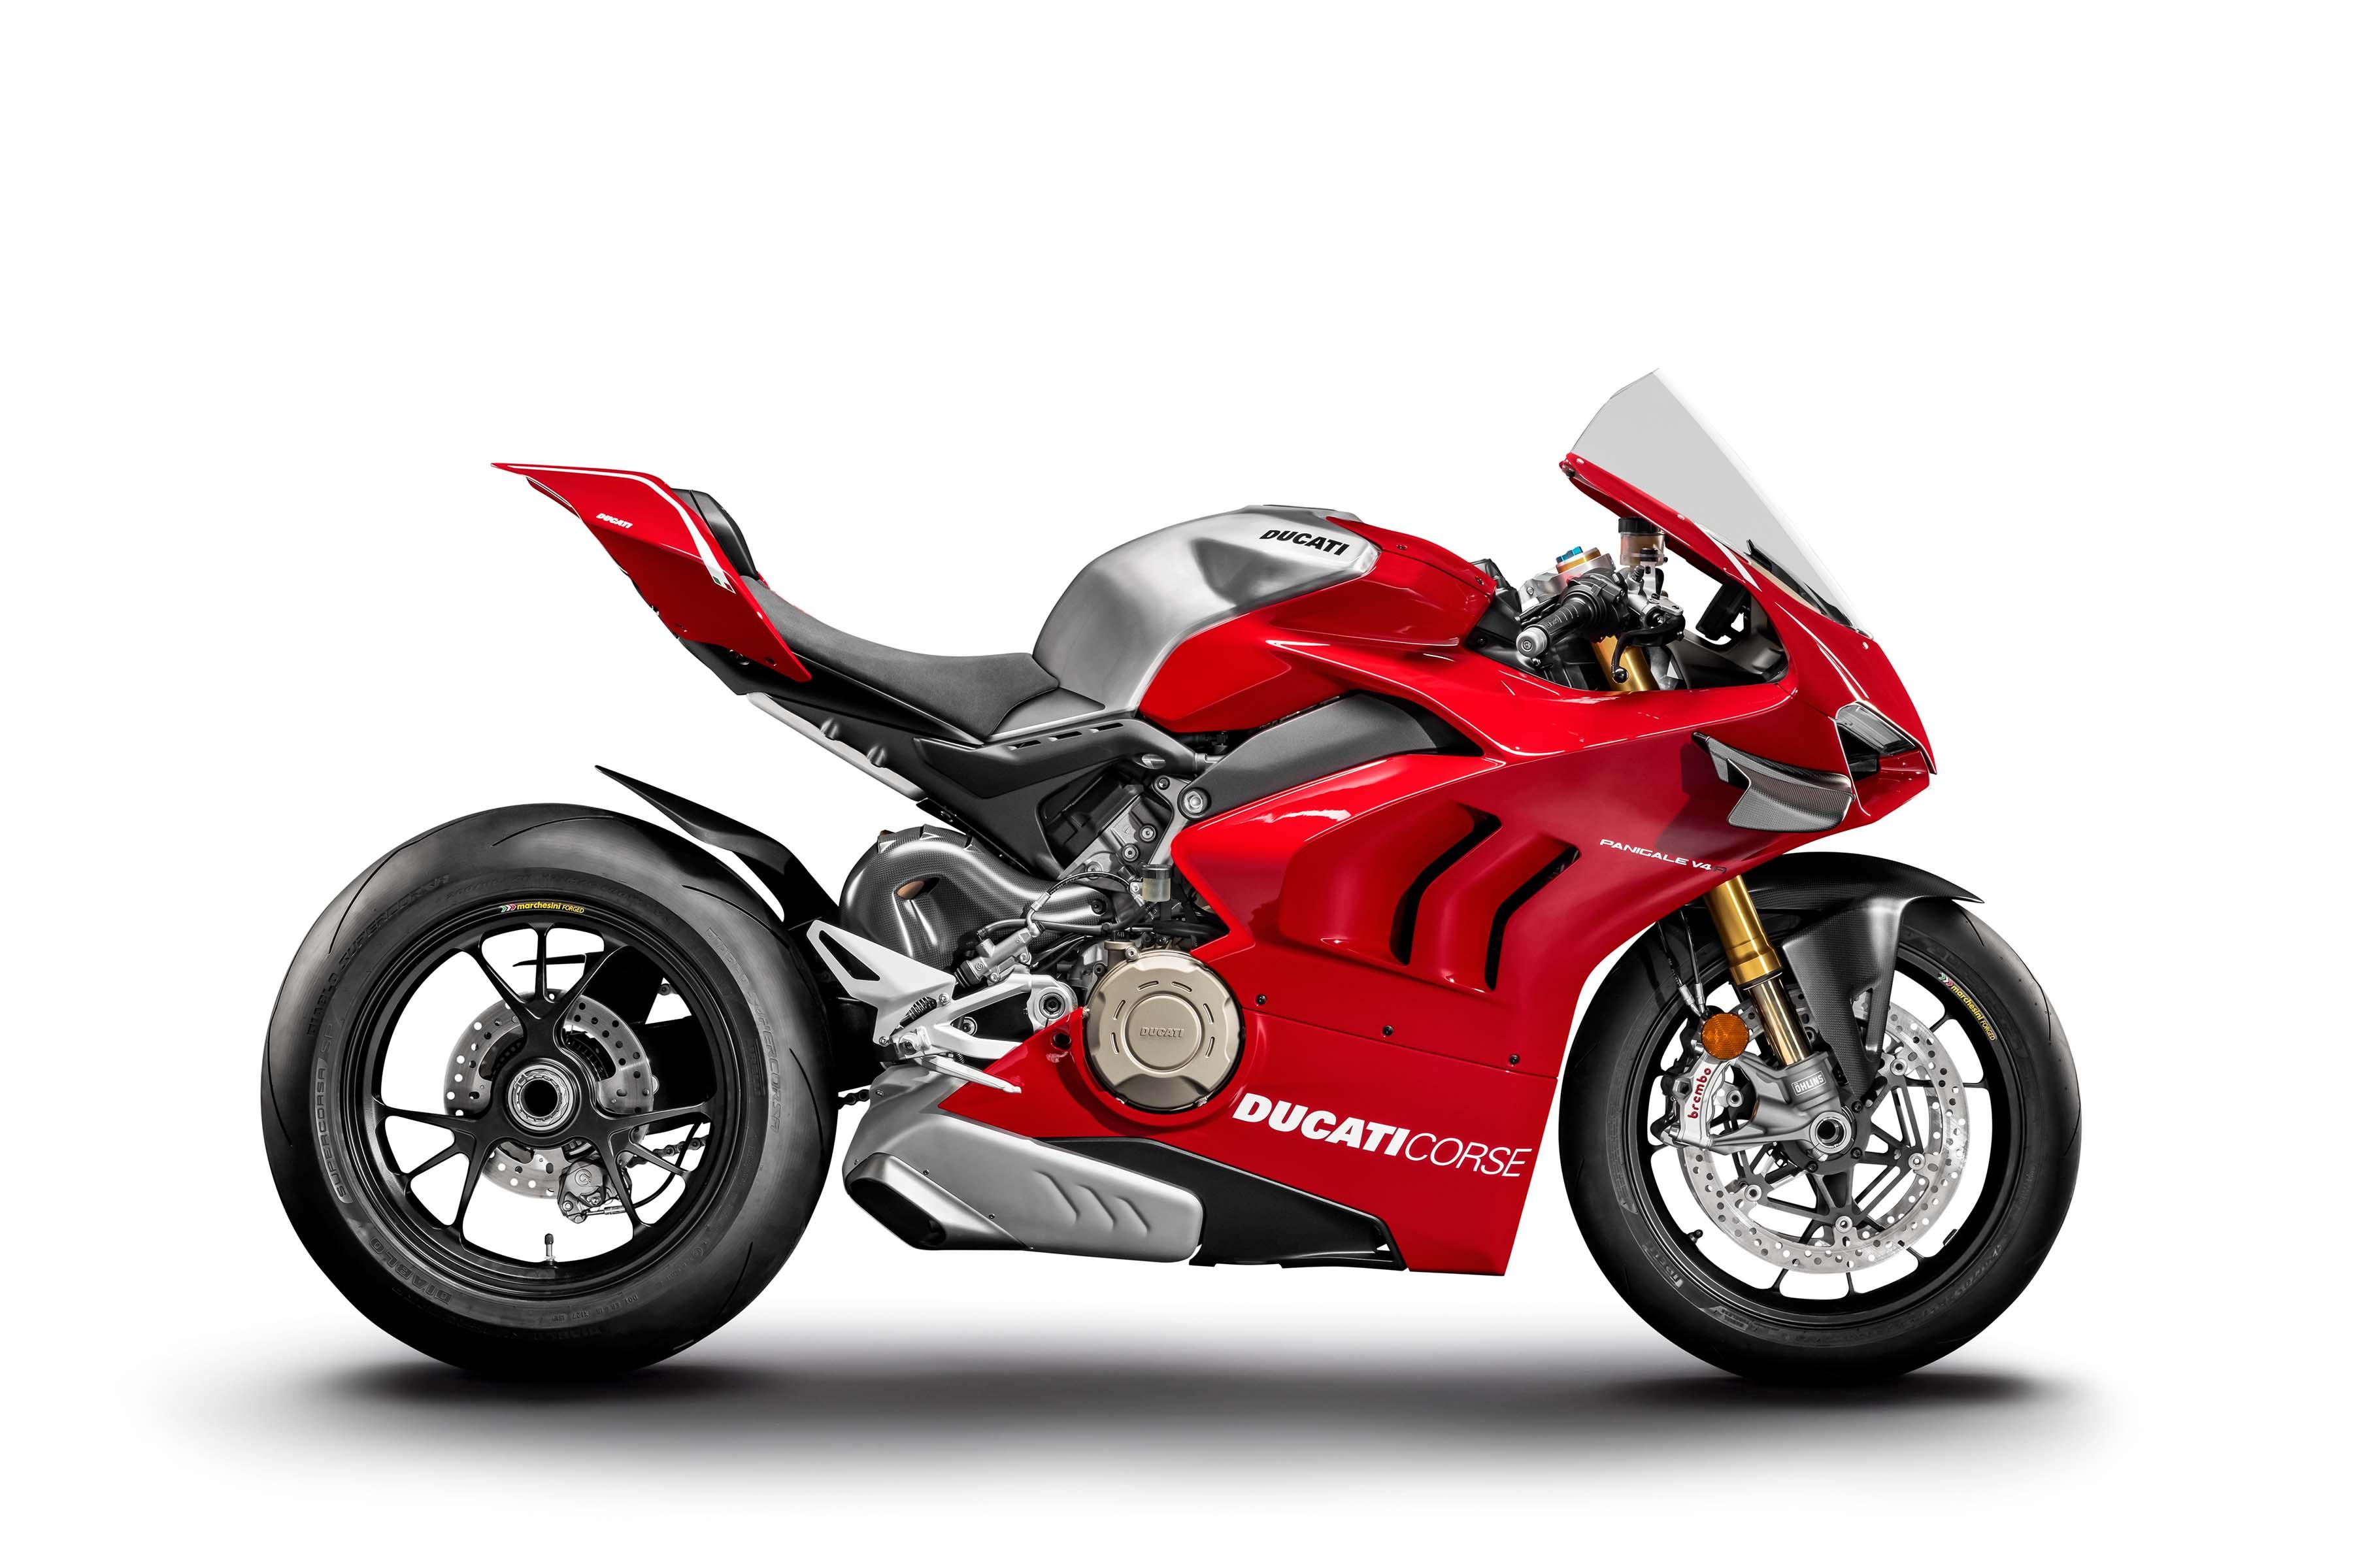 2019-Ducati-Panigale-V4-R-09